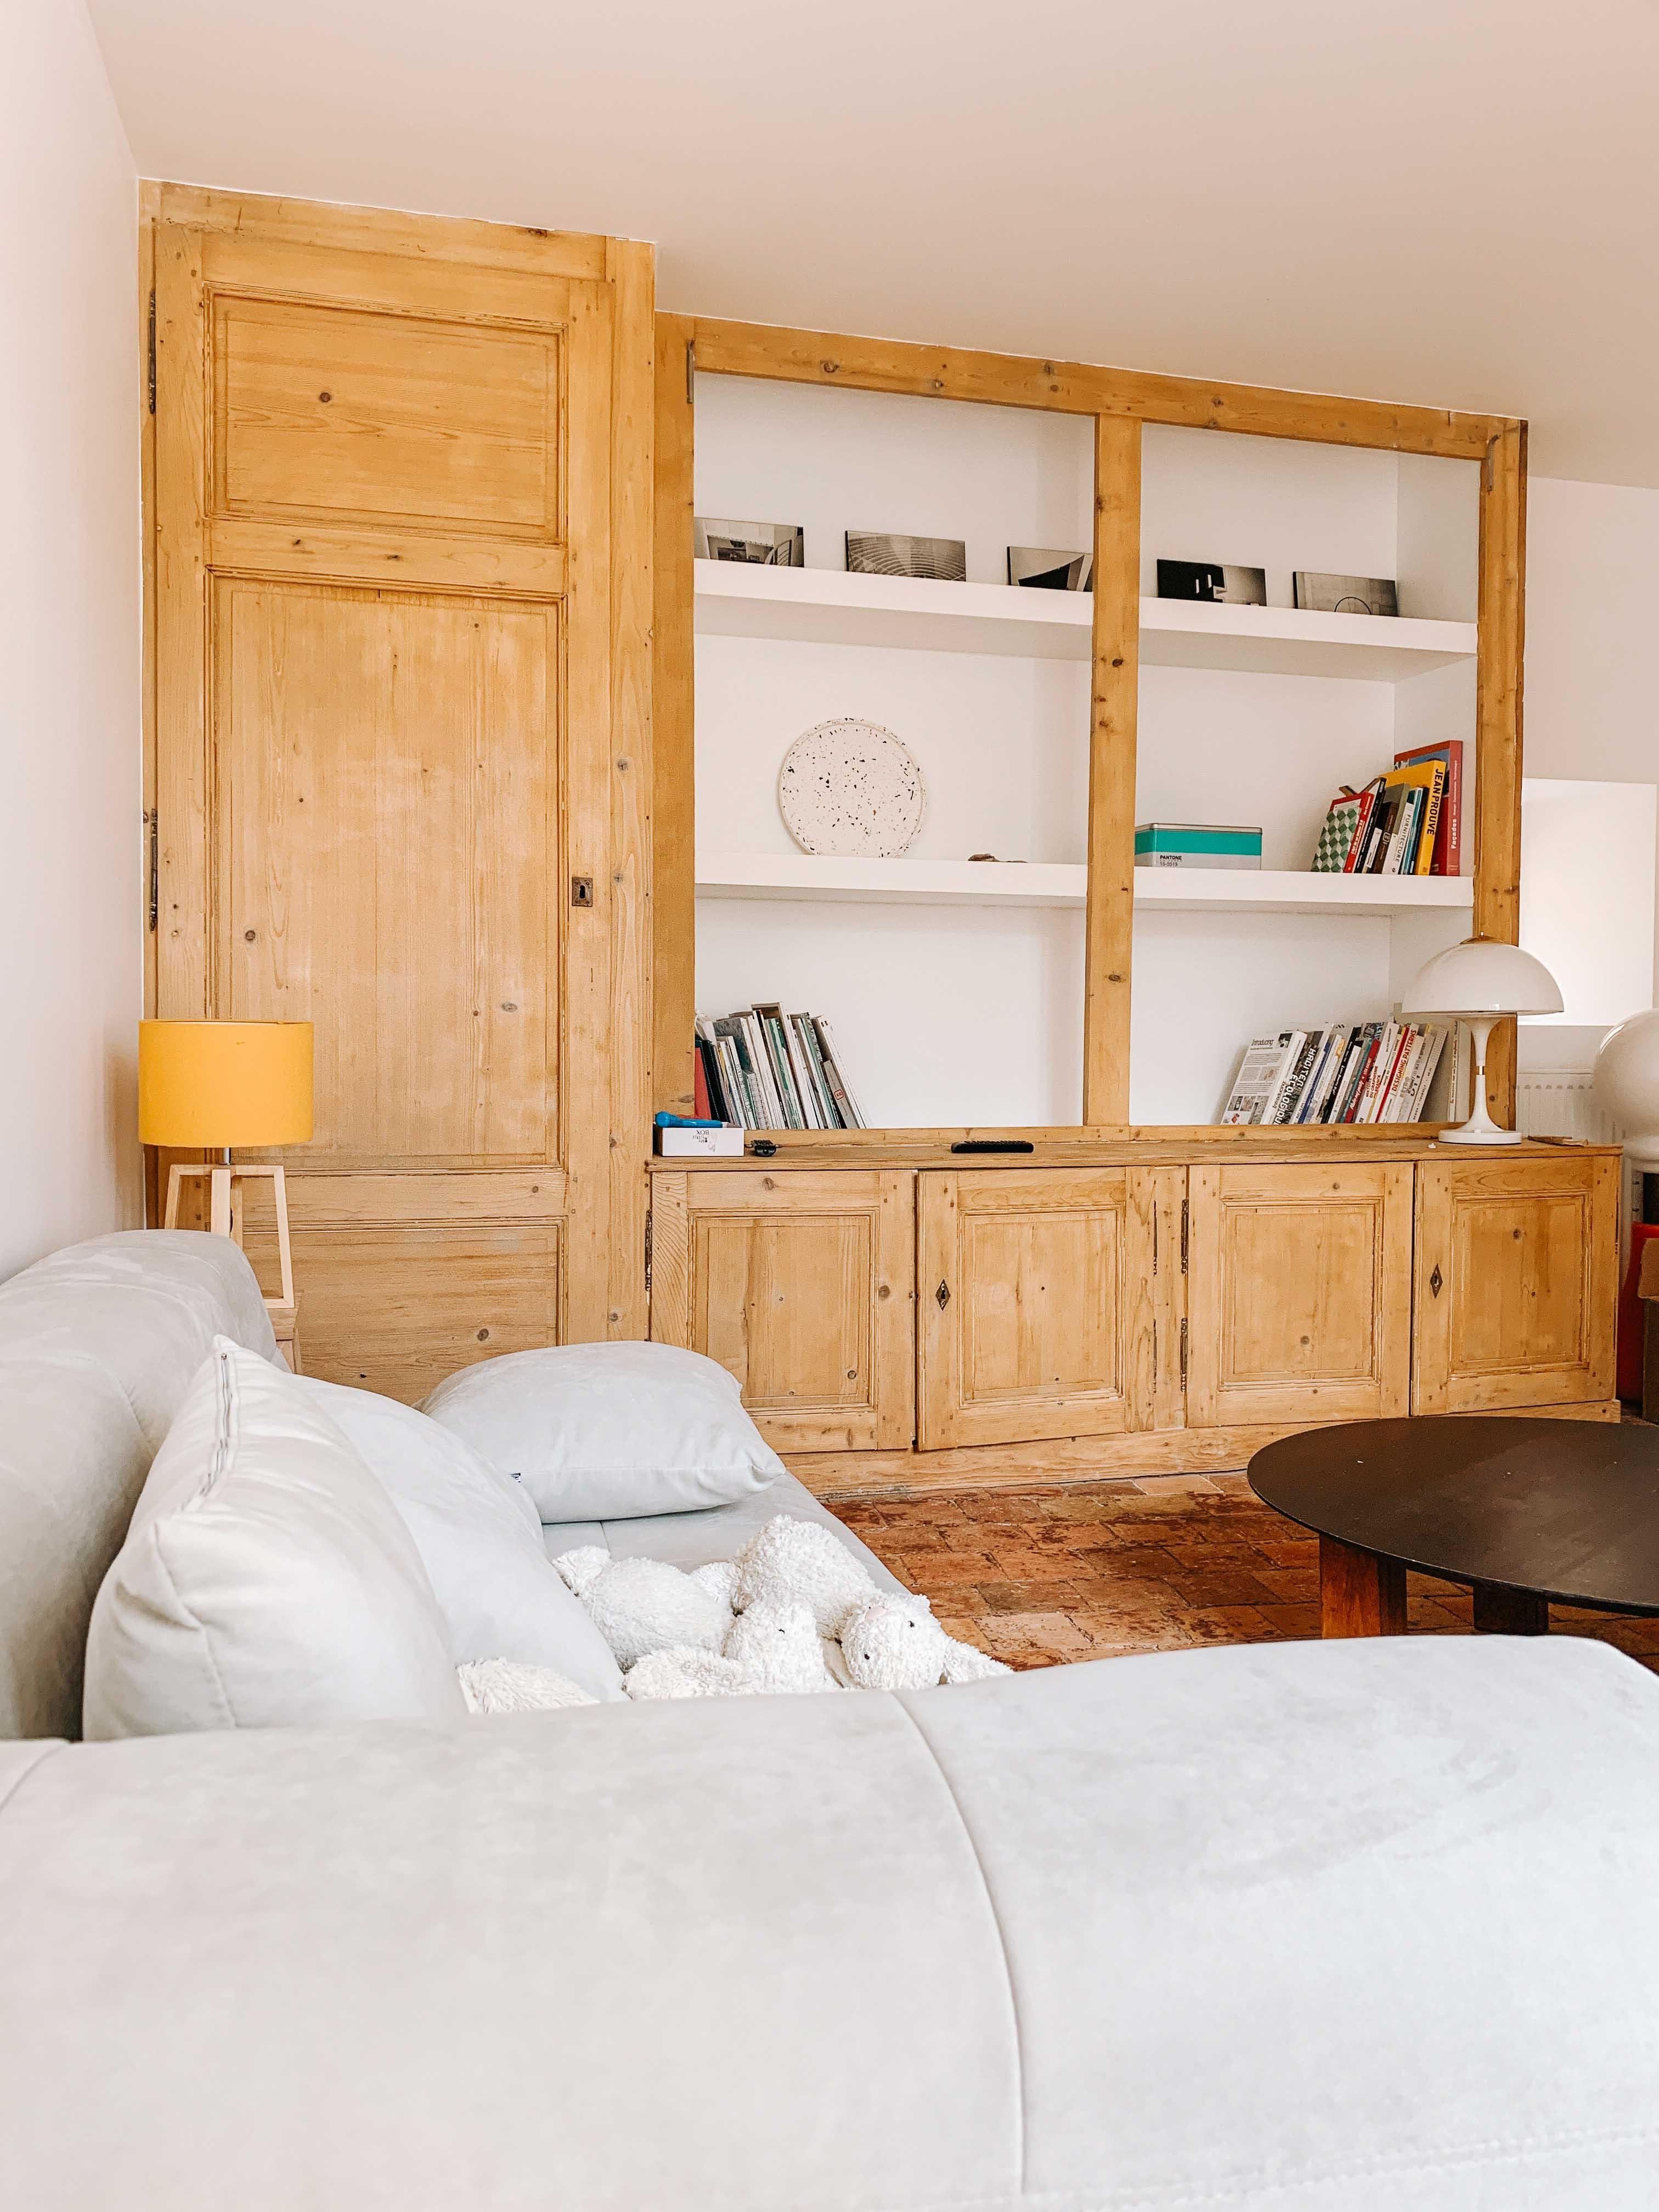 architecte-lyon-rénovation-presbytere-marcilly-azergues-pierre-dorée-13